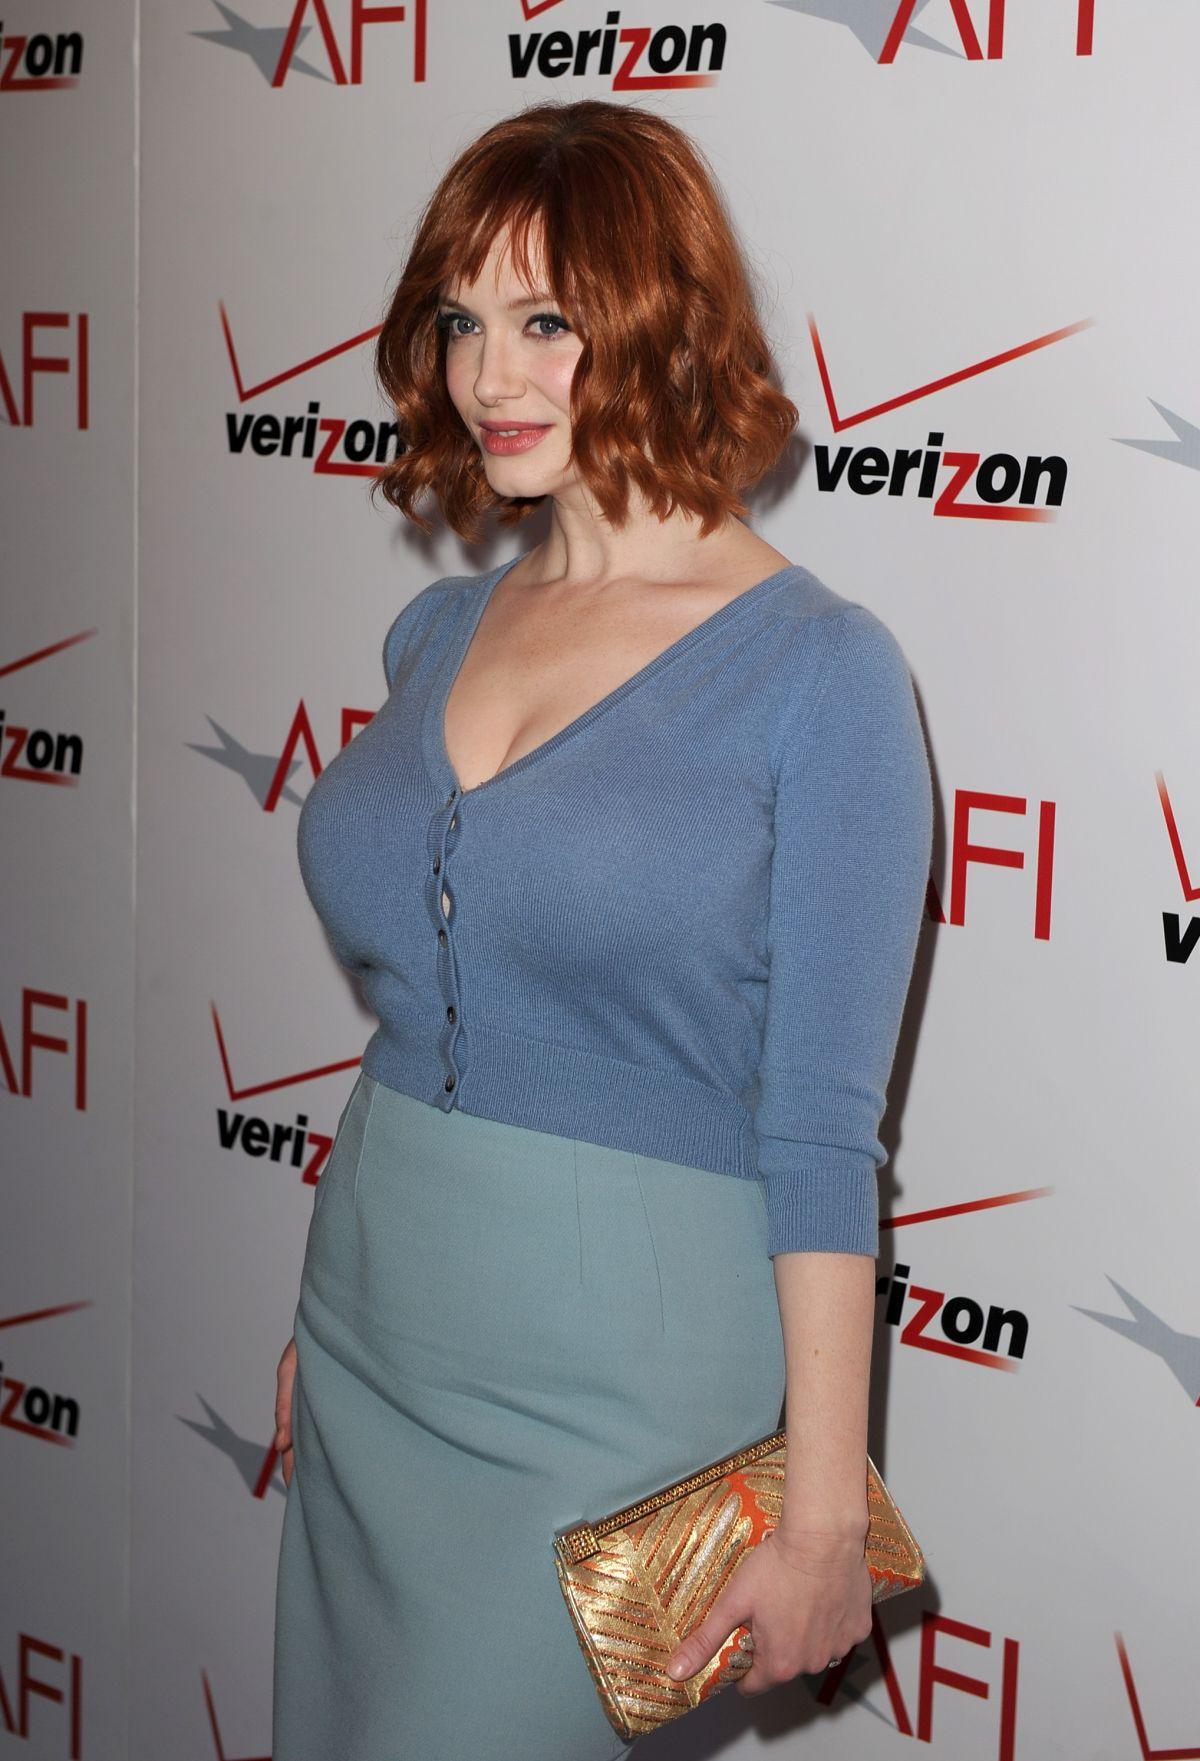 Christina Hendricks attends the 13th Annual AFI Awards